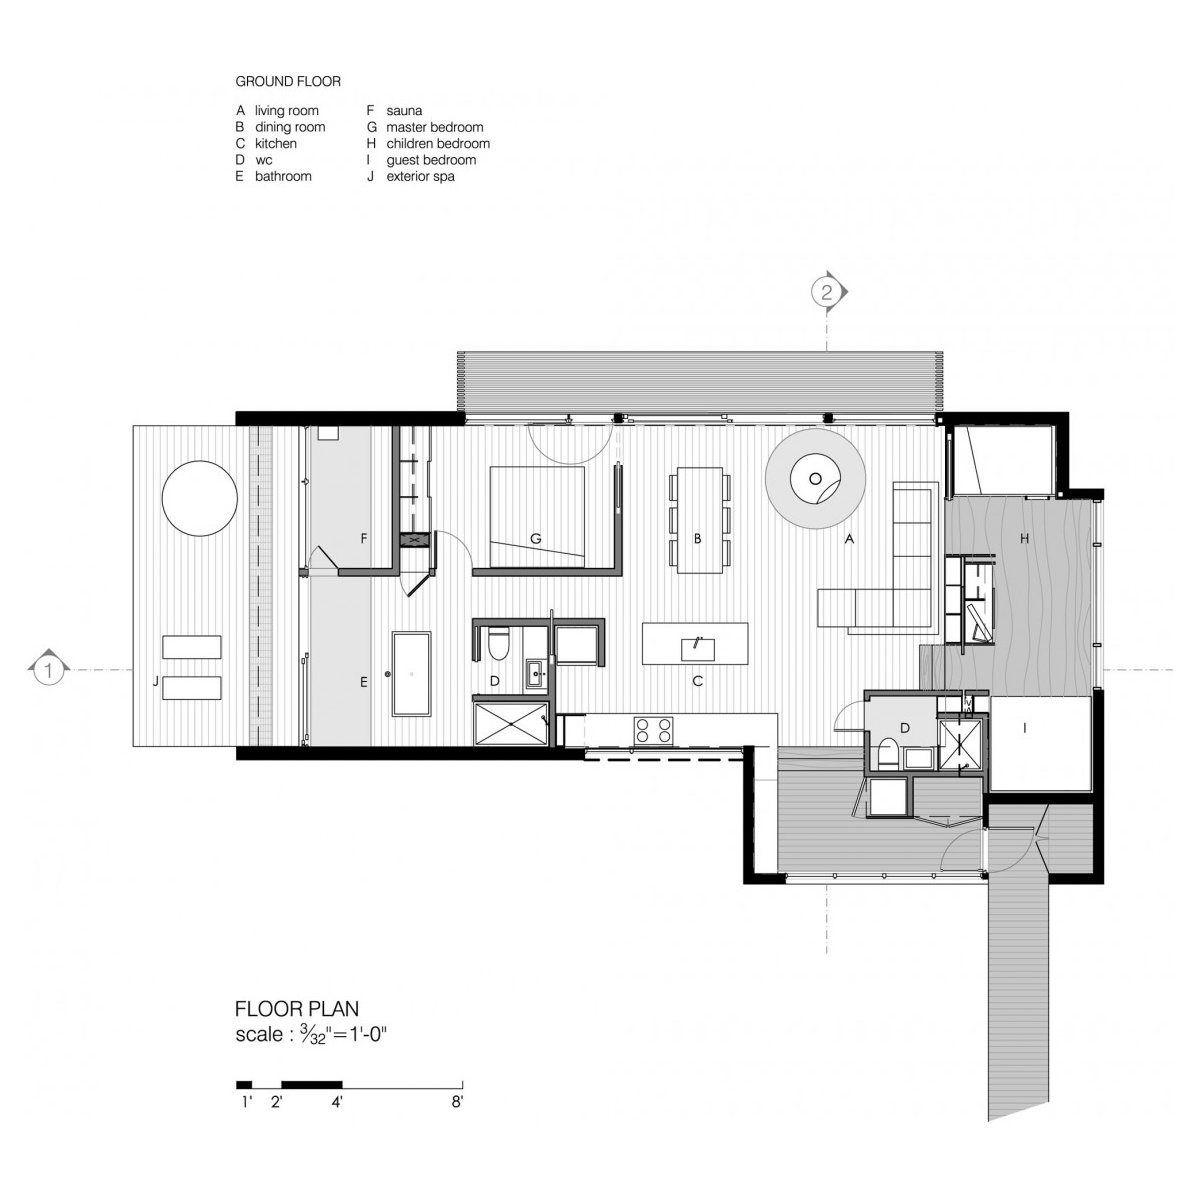 Gallery La Luge By Yiacouvakis Hamelin Luge Cabin Floor Plans Floor Plans